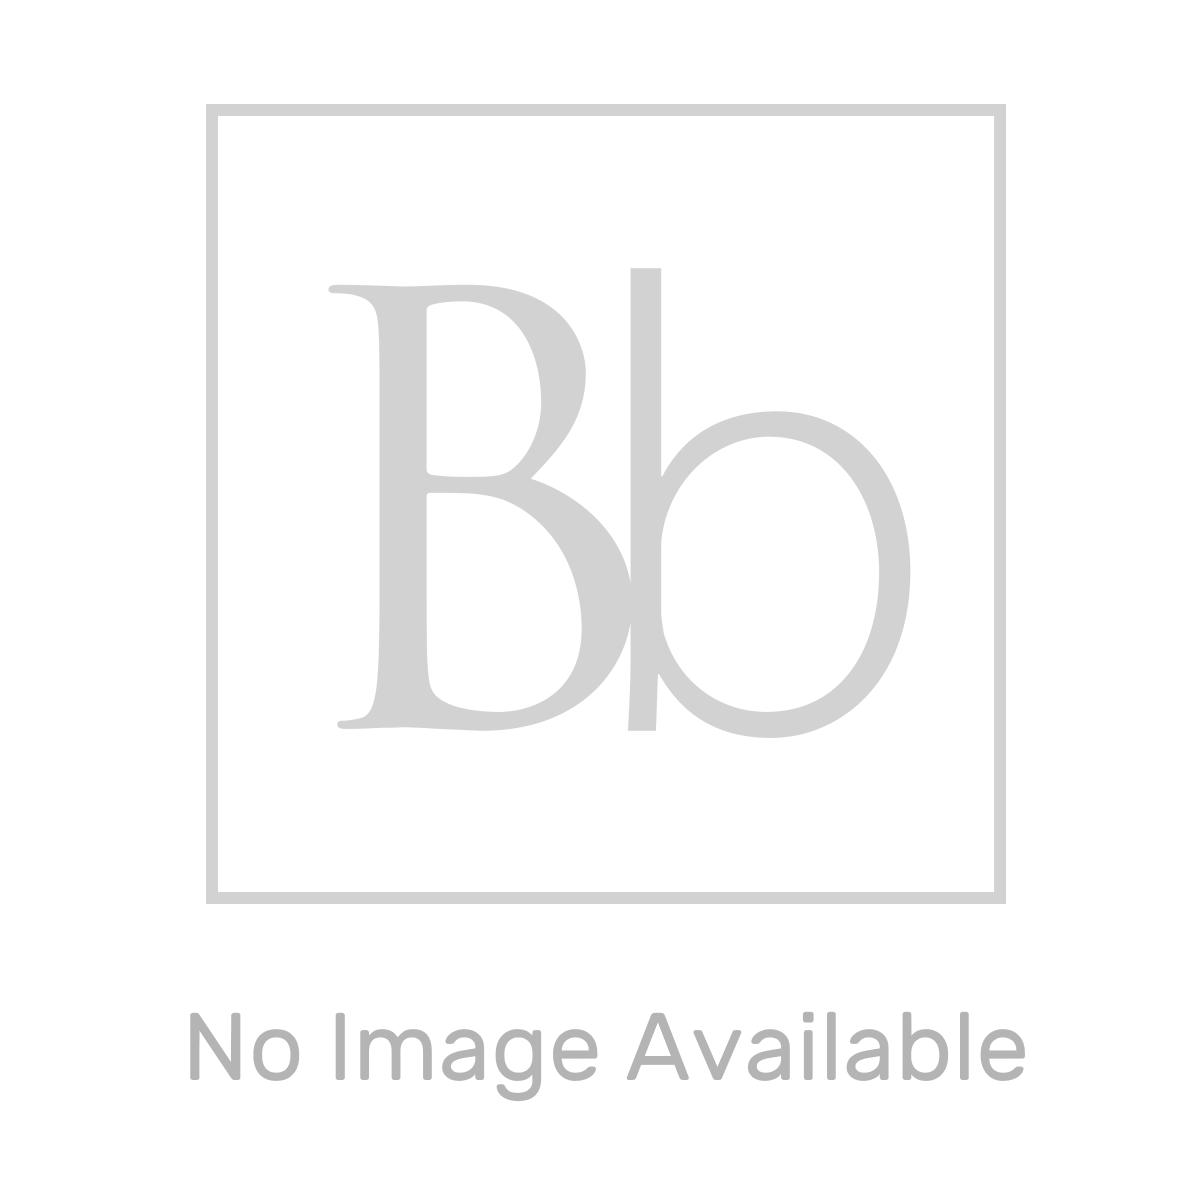 Kartell Astley Matt Grey End Bath Panel 700mm